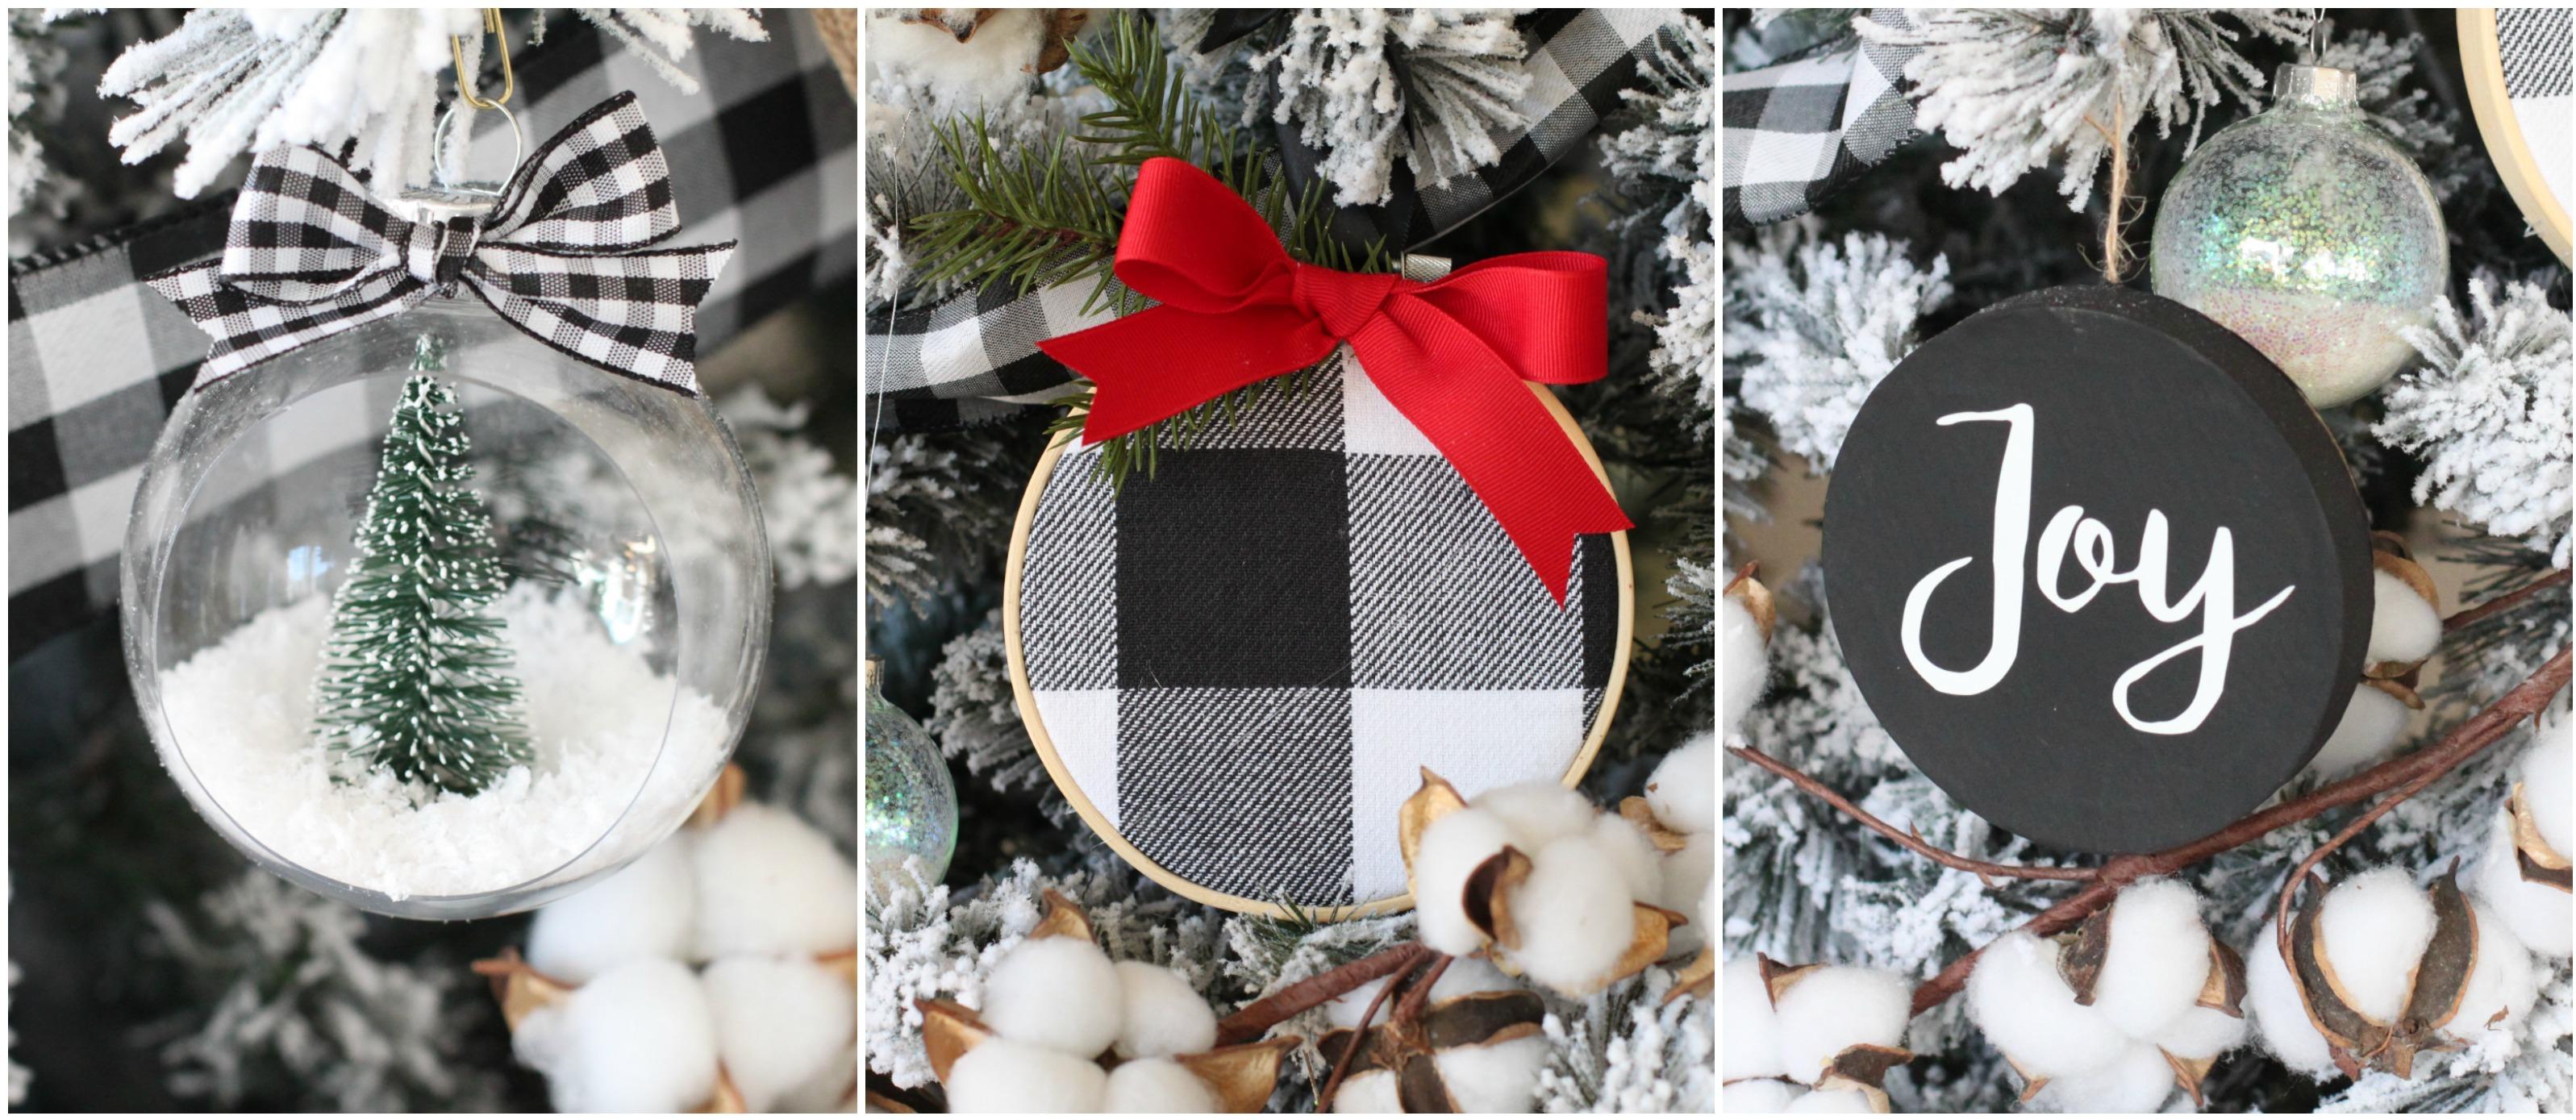 5 Diy Christmas Ornaments For Black White Christmas Tree Fun365